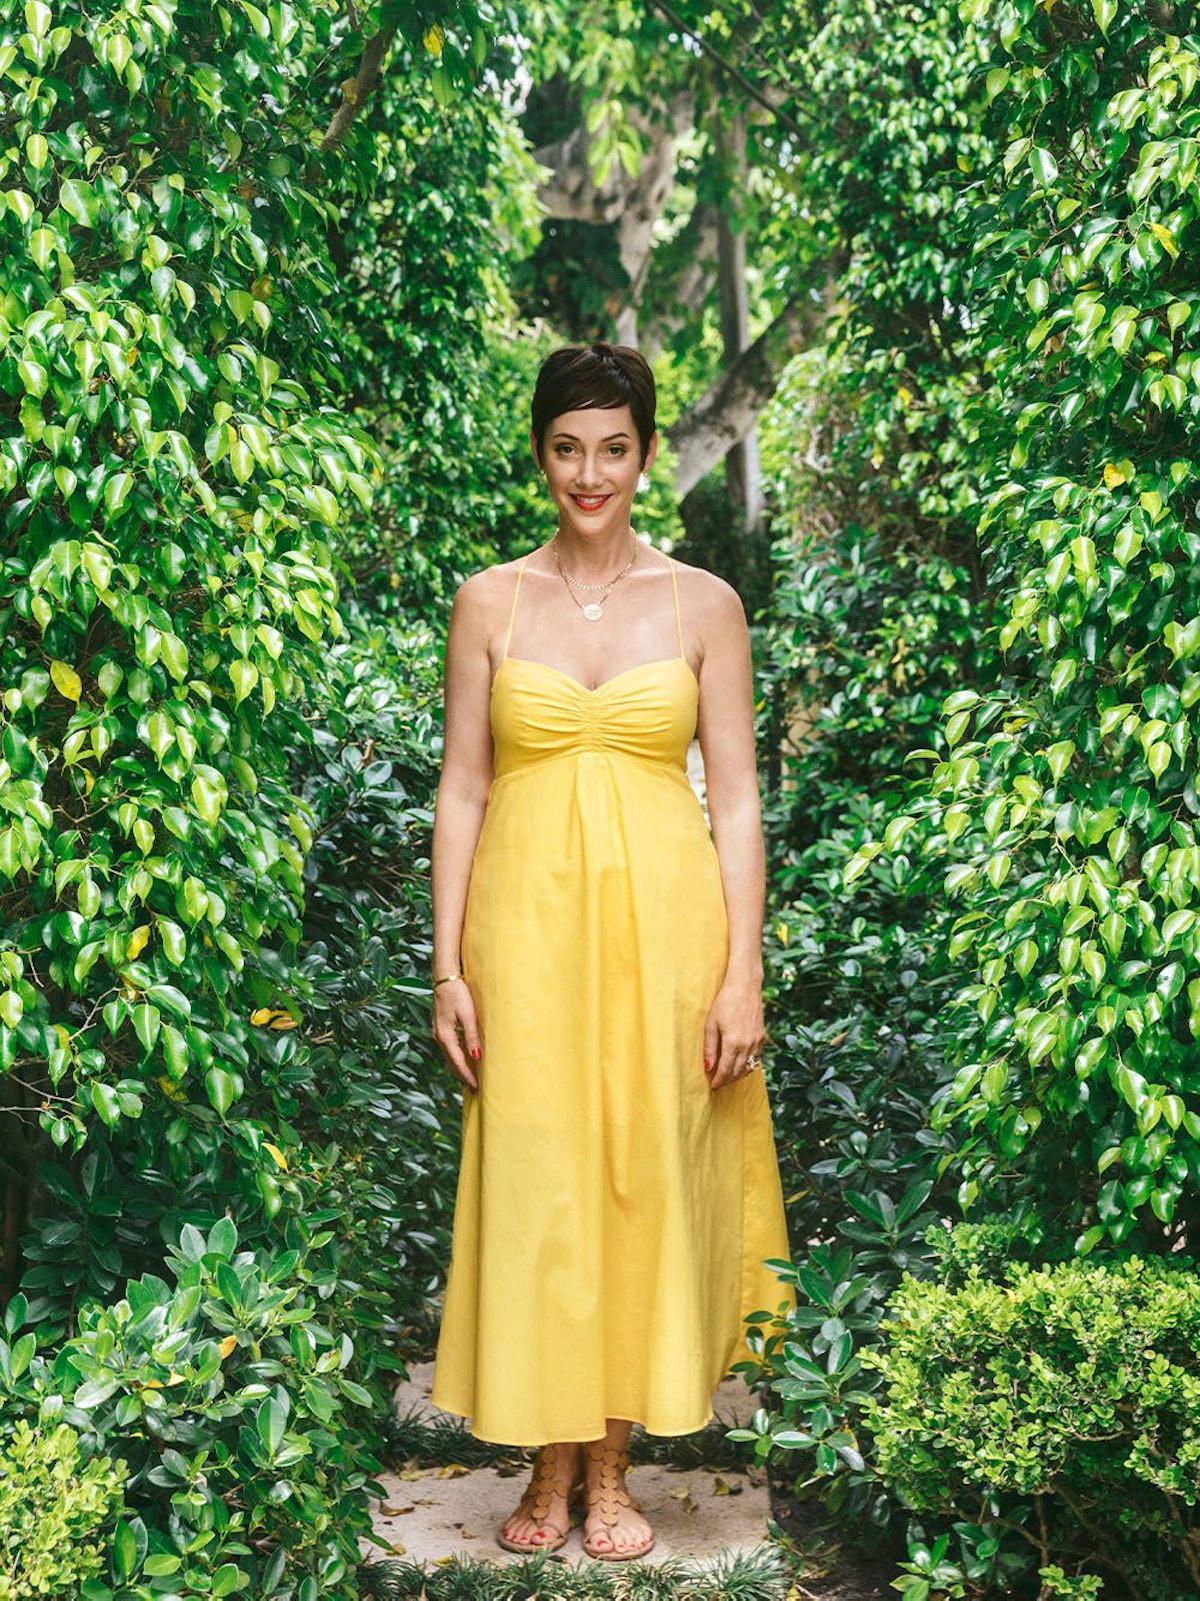 Kirna Zabete's yellow Marilyn spaghetti-strapped dress.